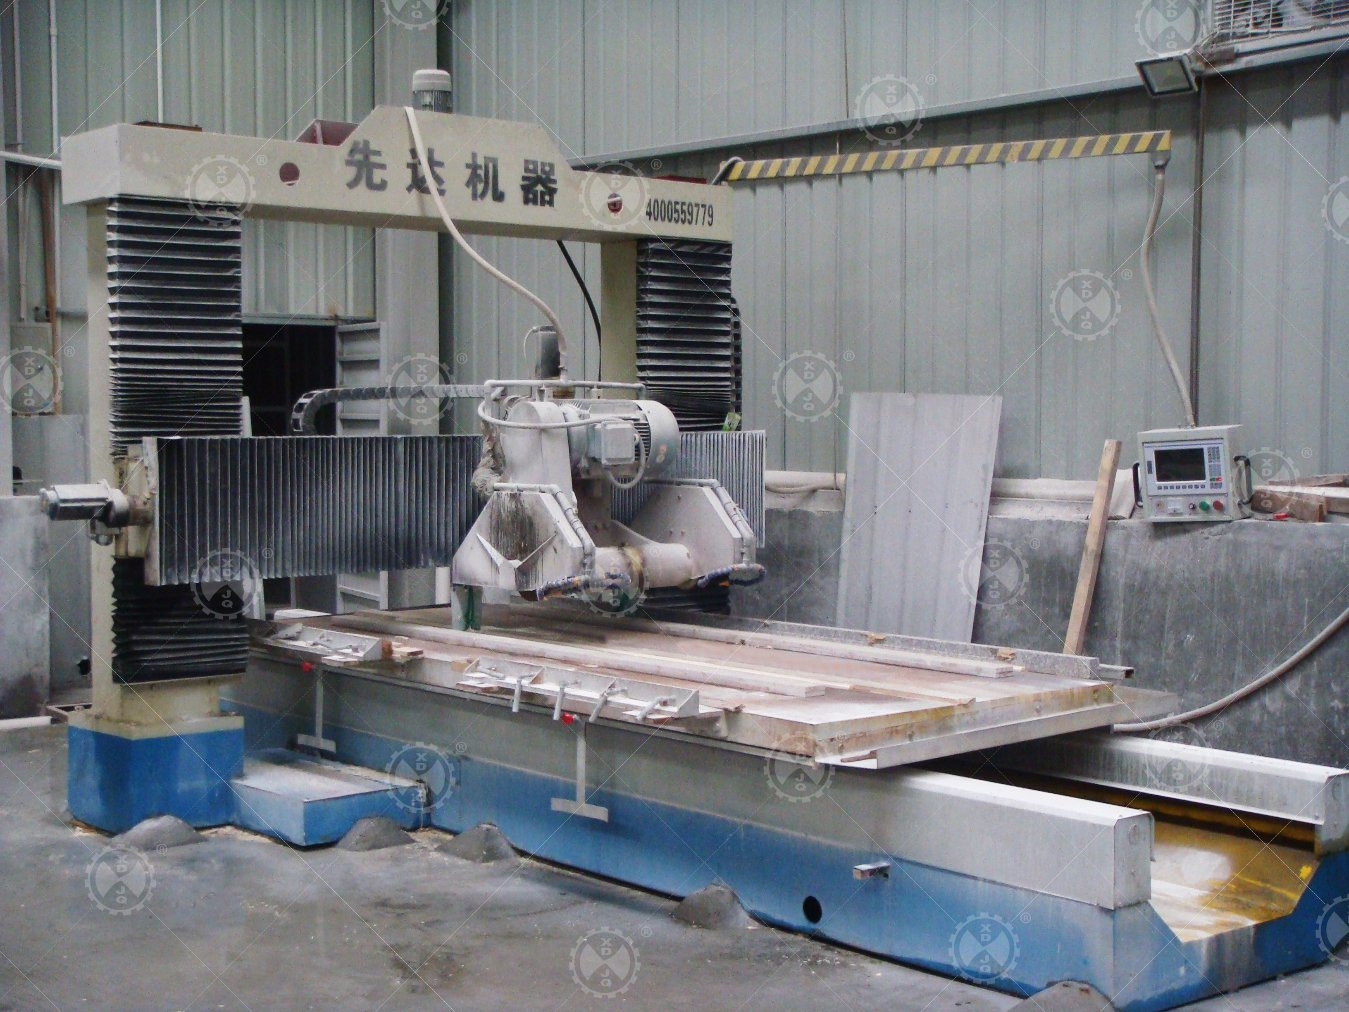 Scnfx-1800 CNC Automatic Gantry Stone Profiling Cutting Machine